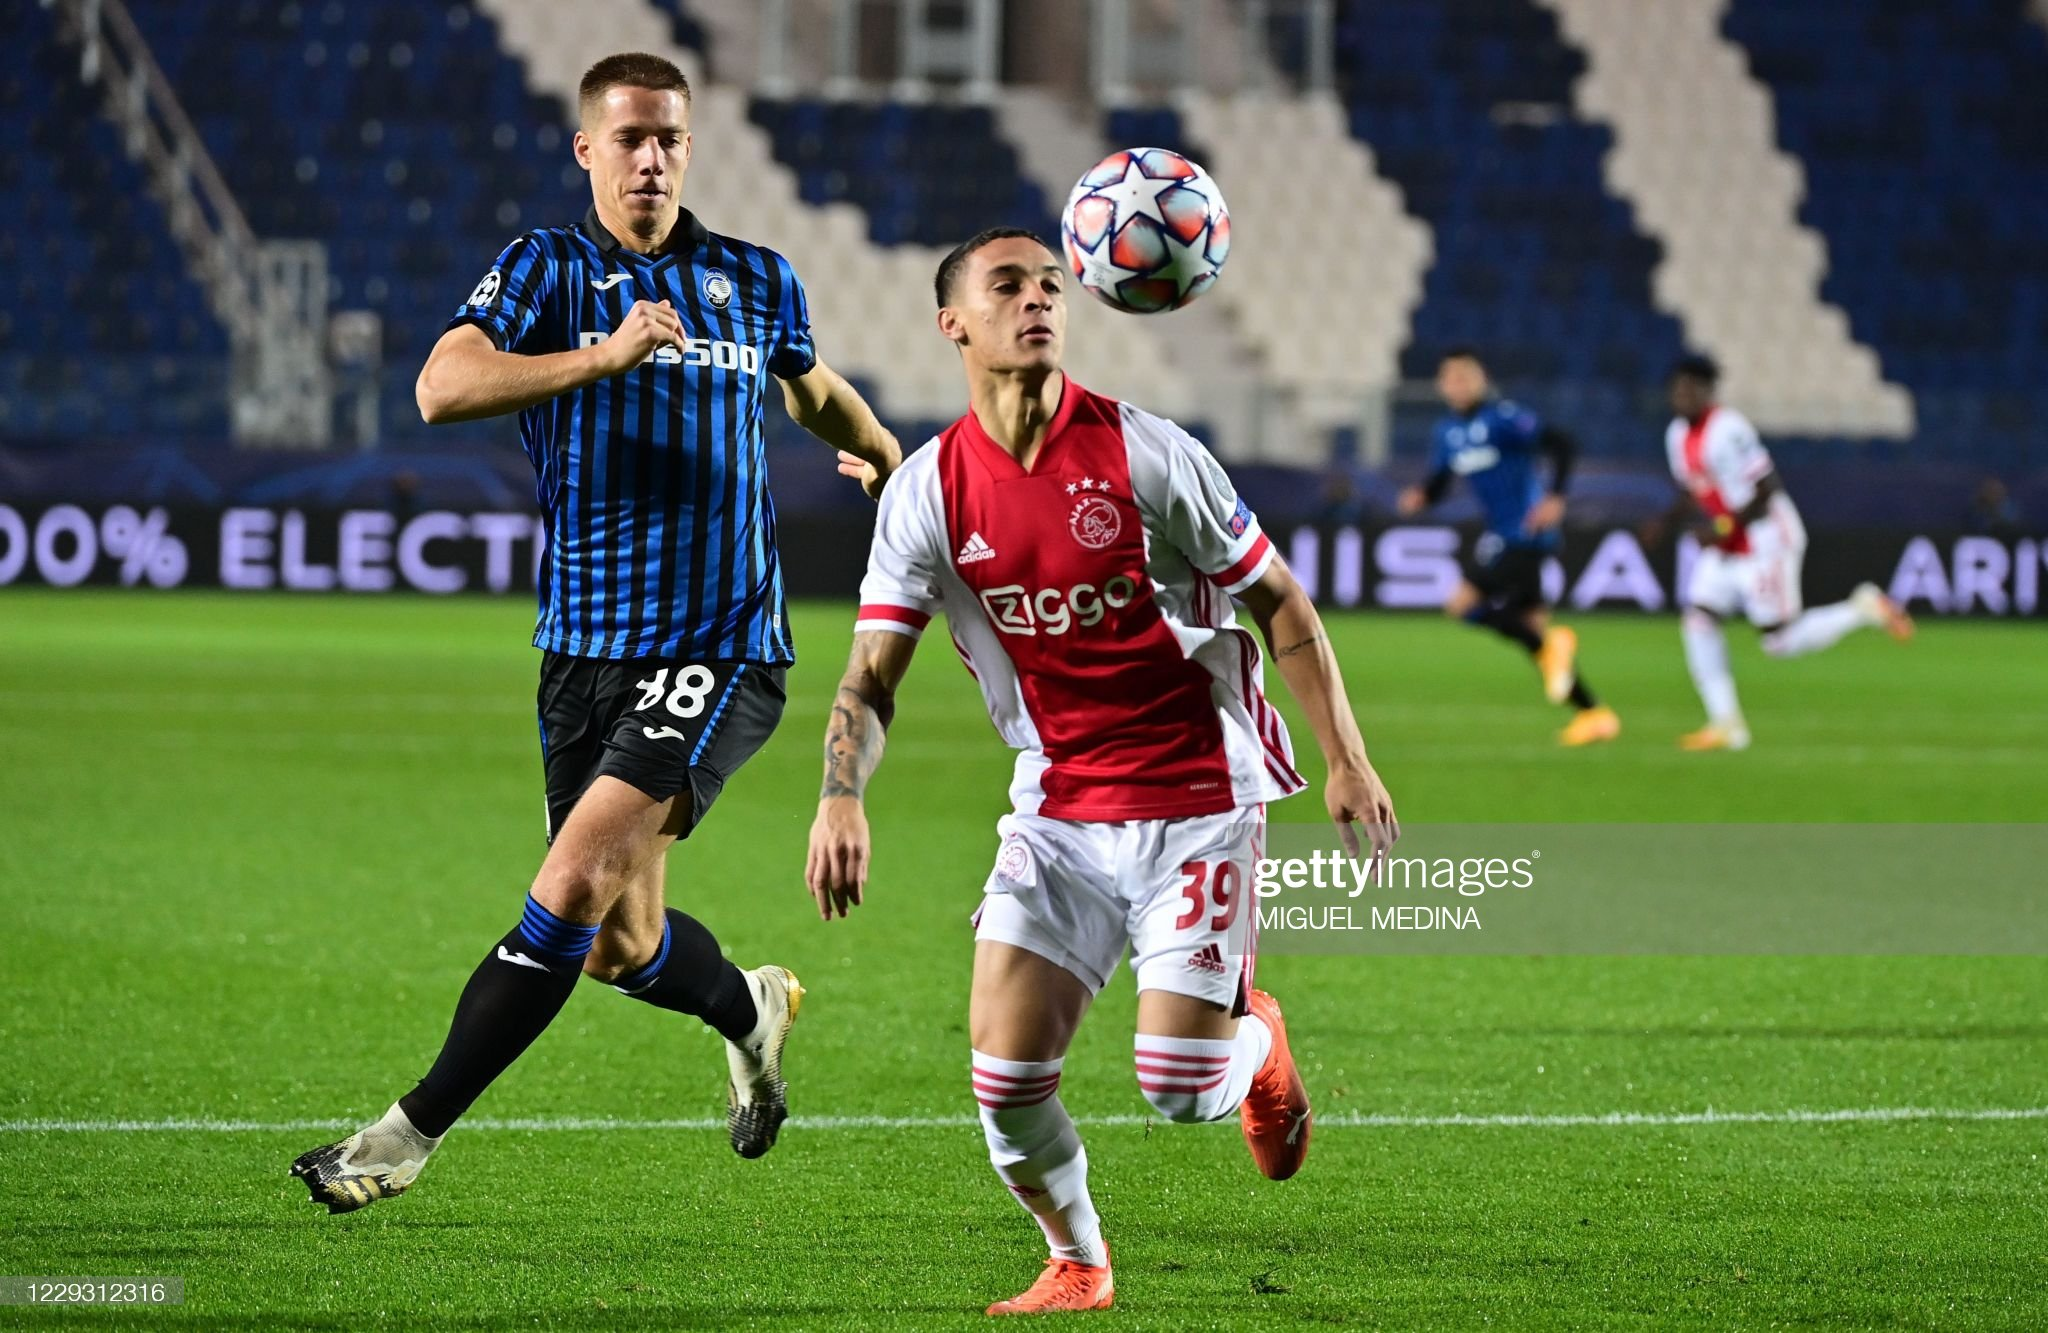 Ajax vs Atalanta preview, prediction and odds